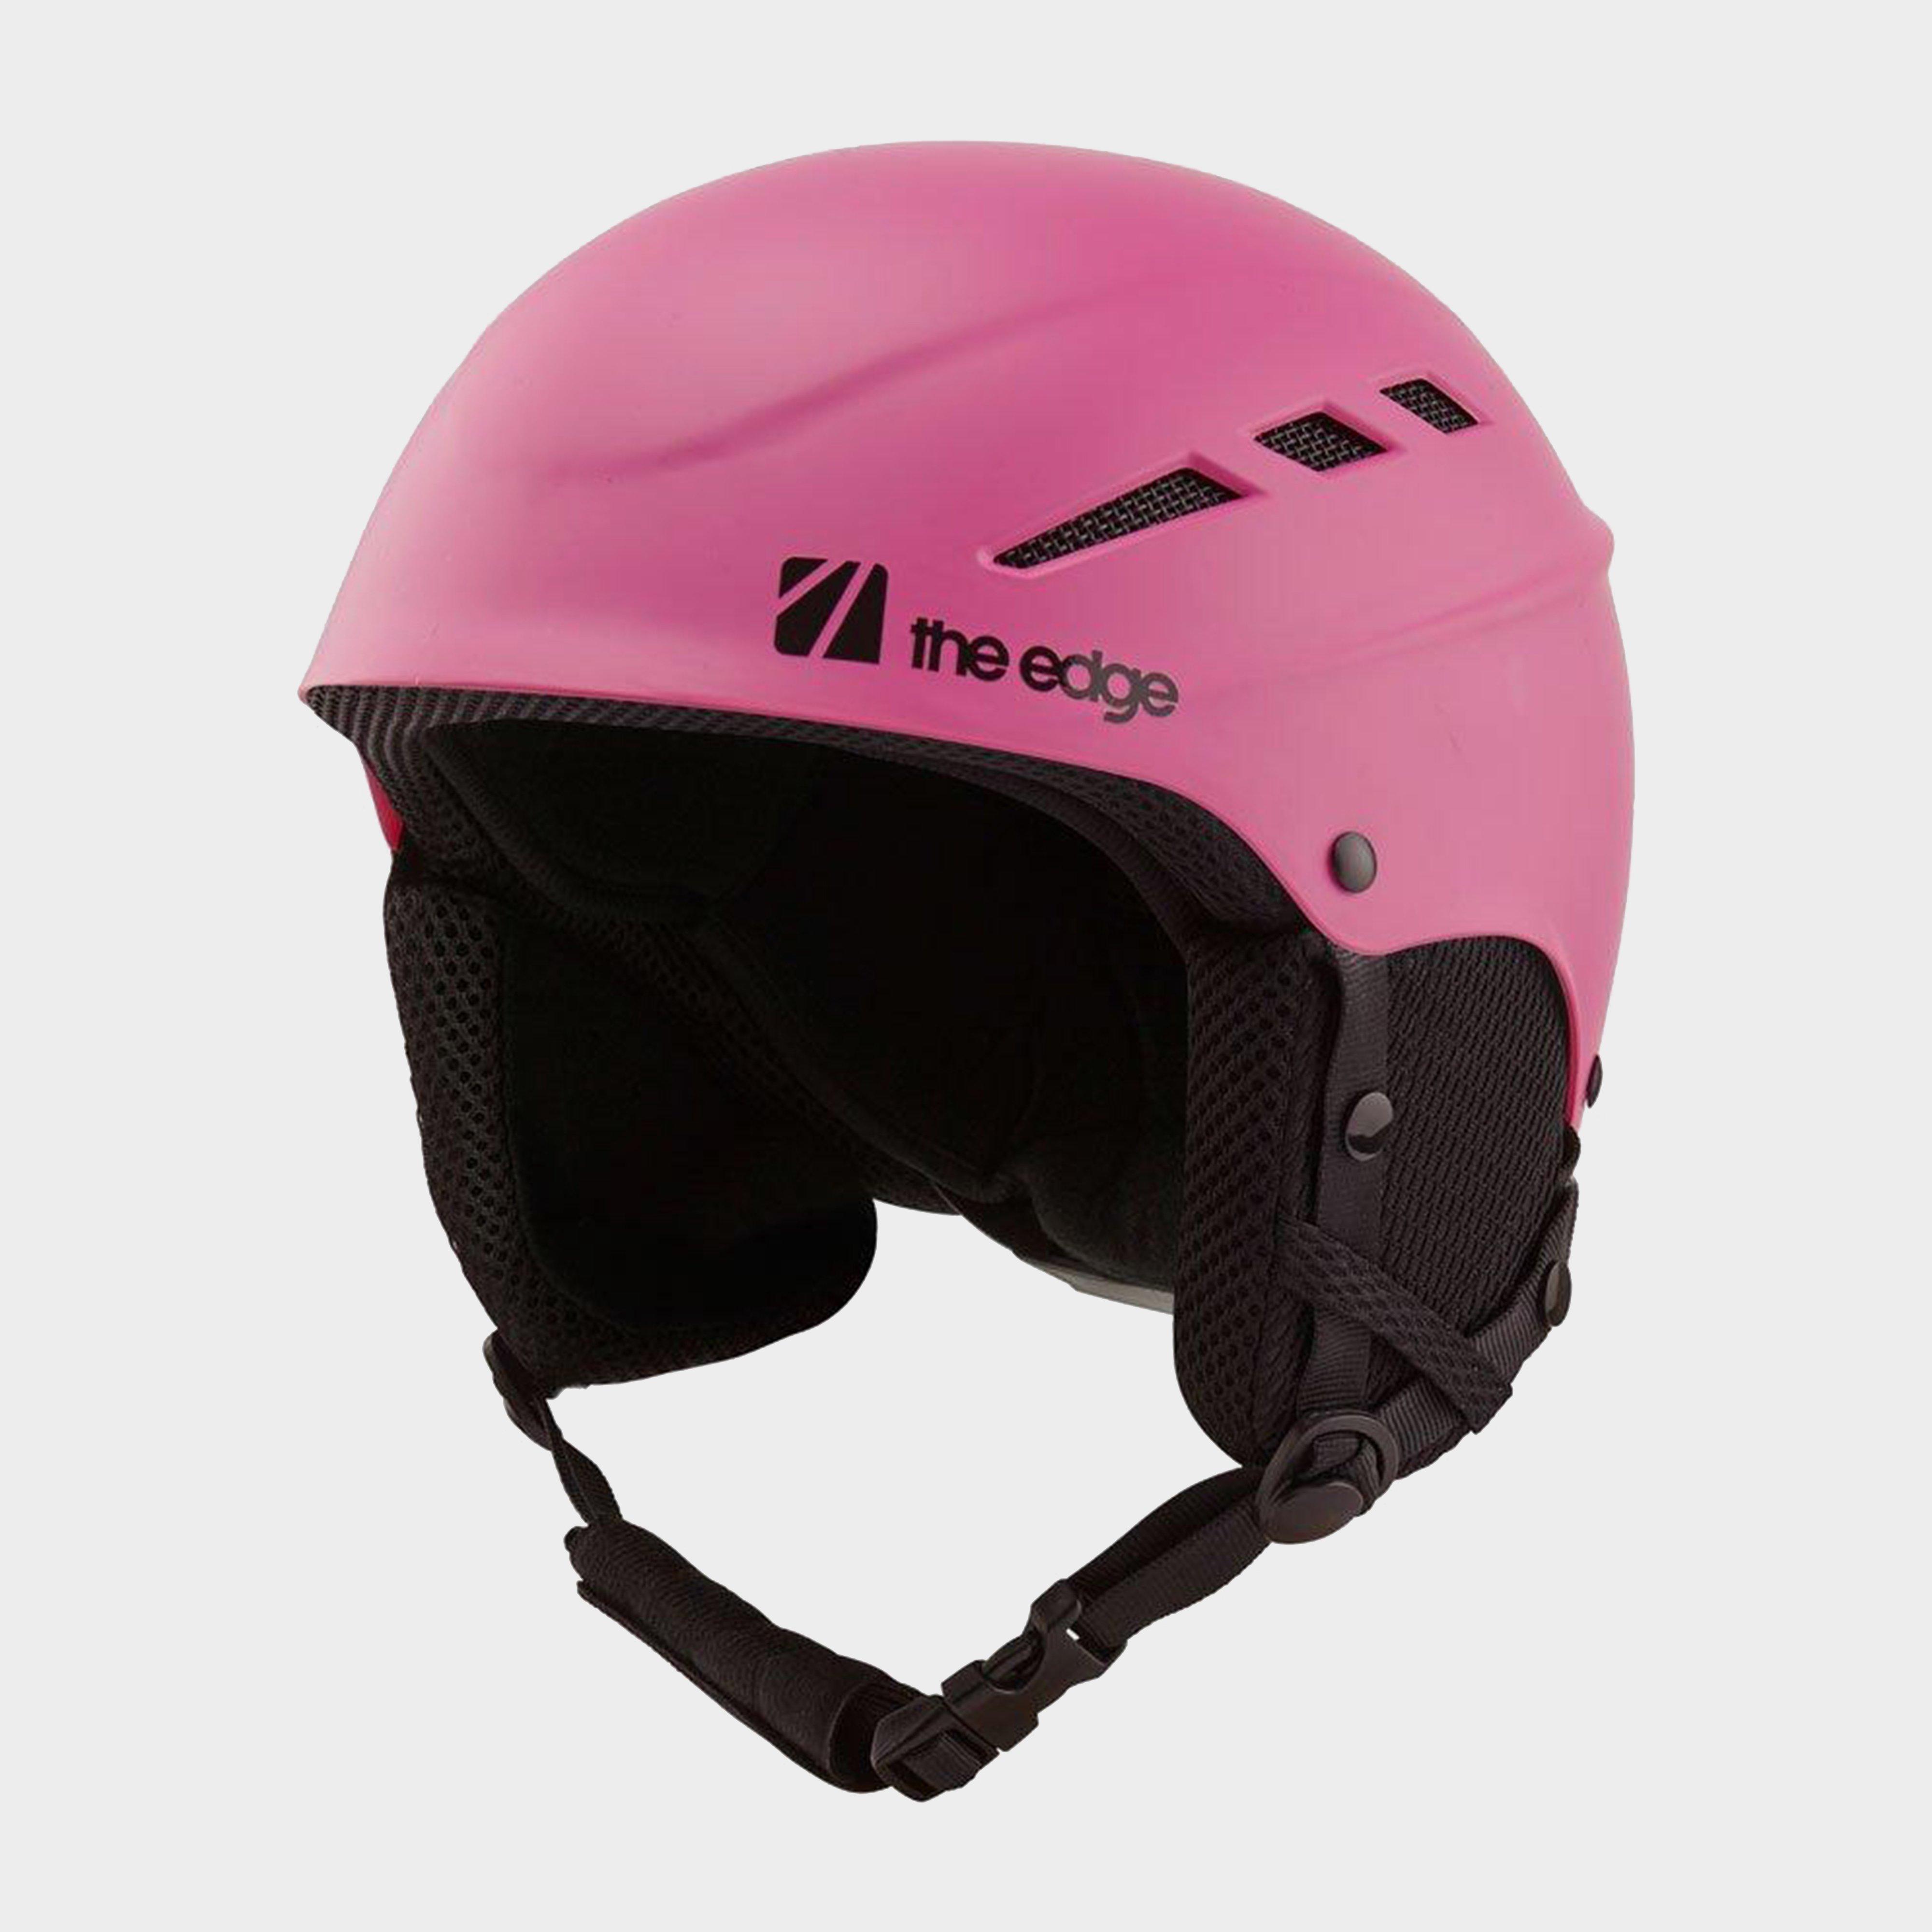 The Edge Yukio Jnr Kids' Snow Helmet - Pink/Helmet, Pink